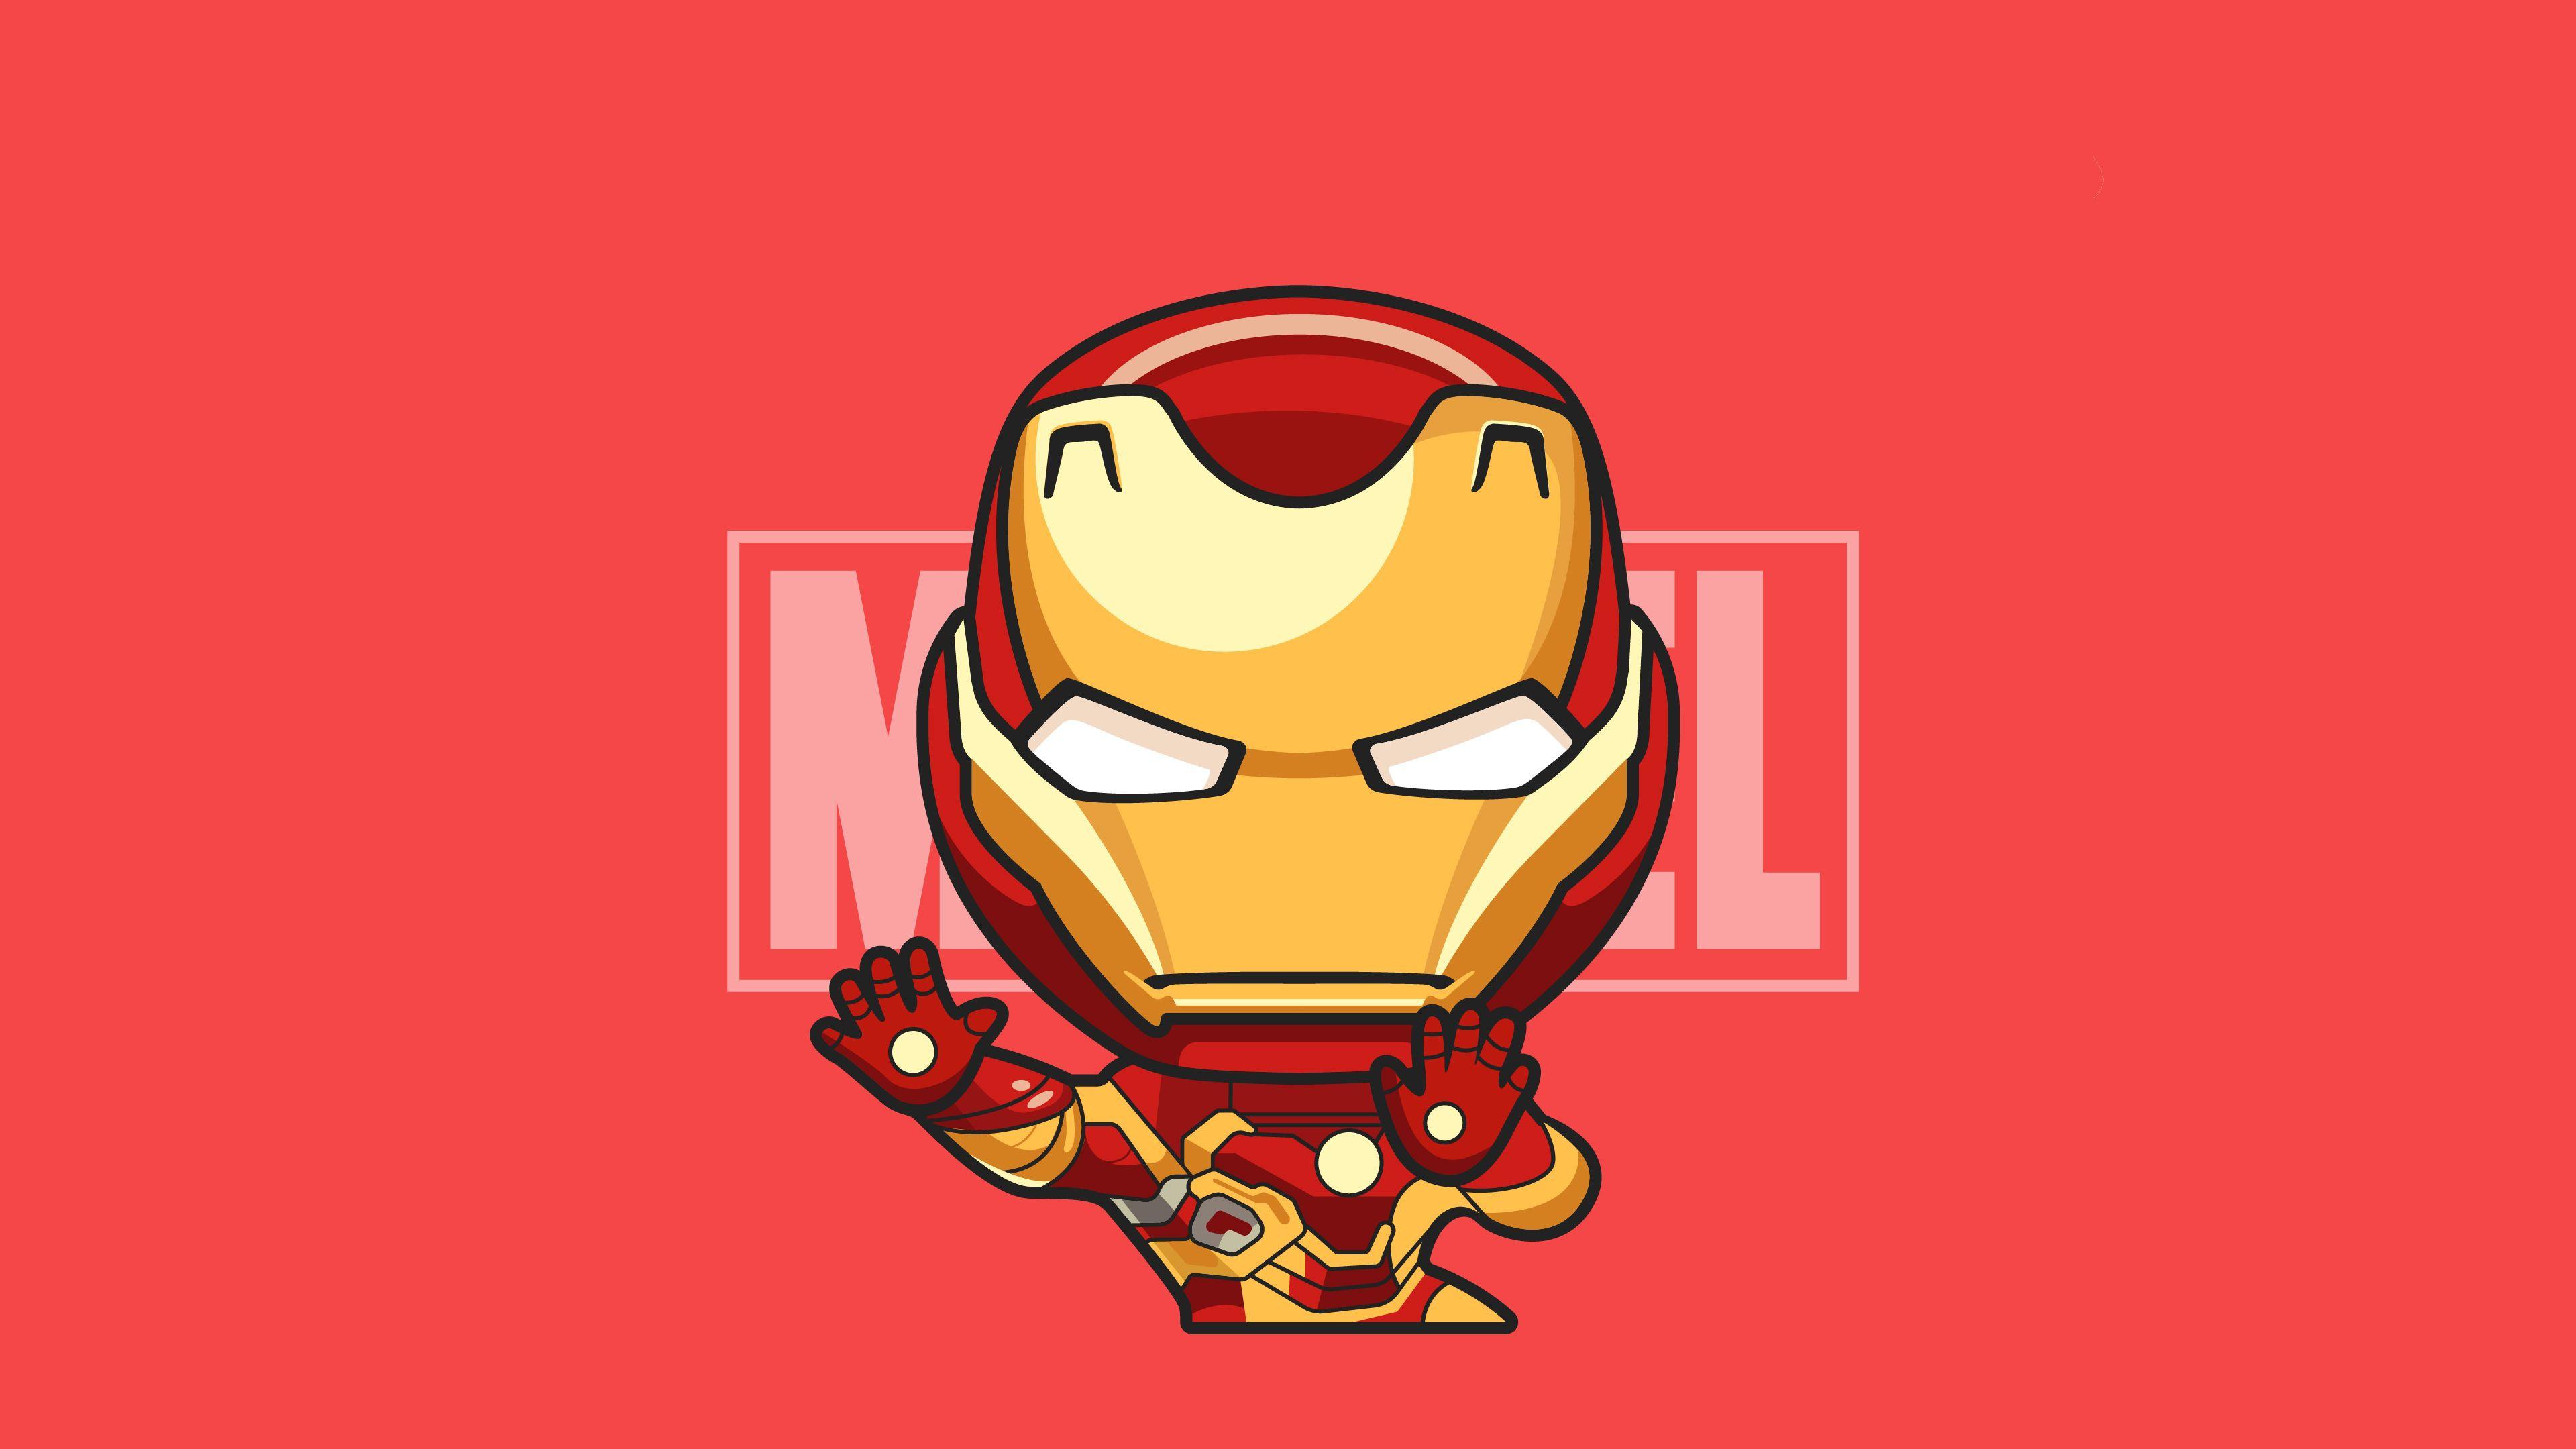 Iron Man Animated Wallpaper 4k